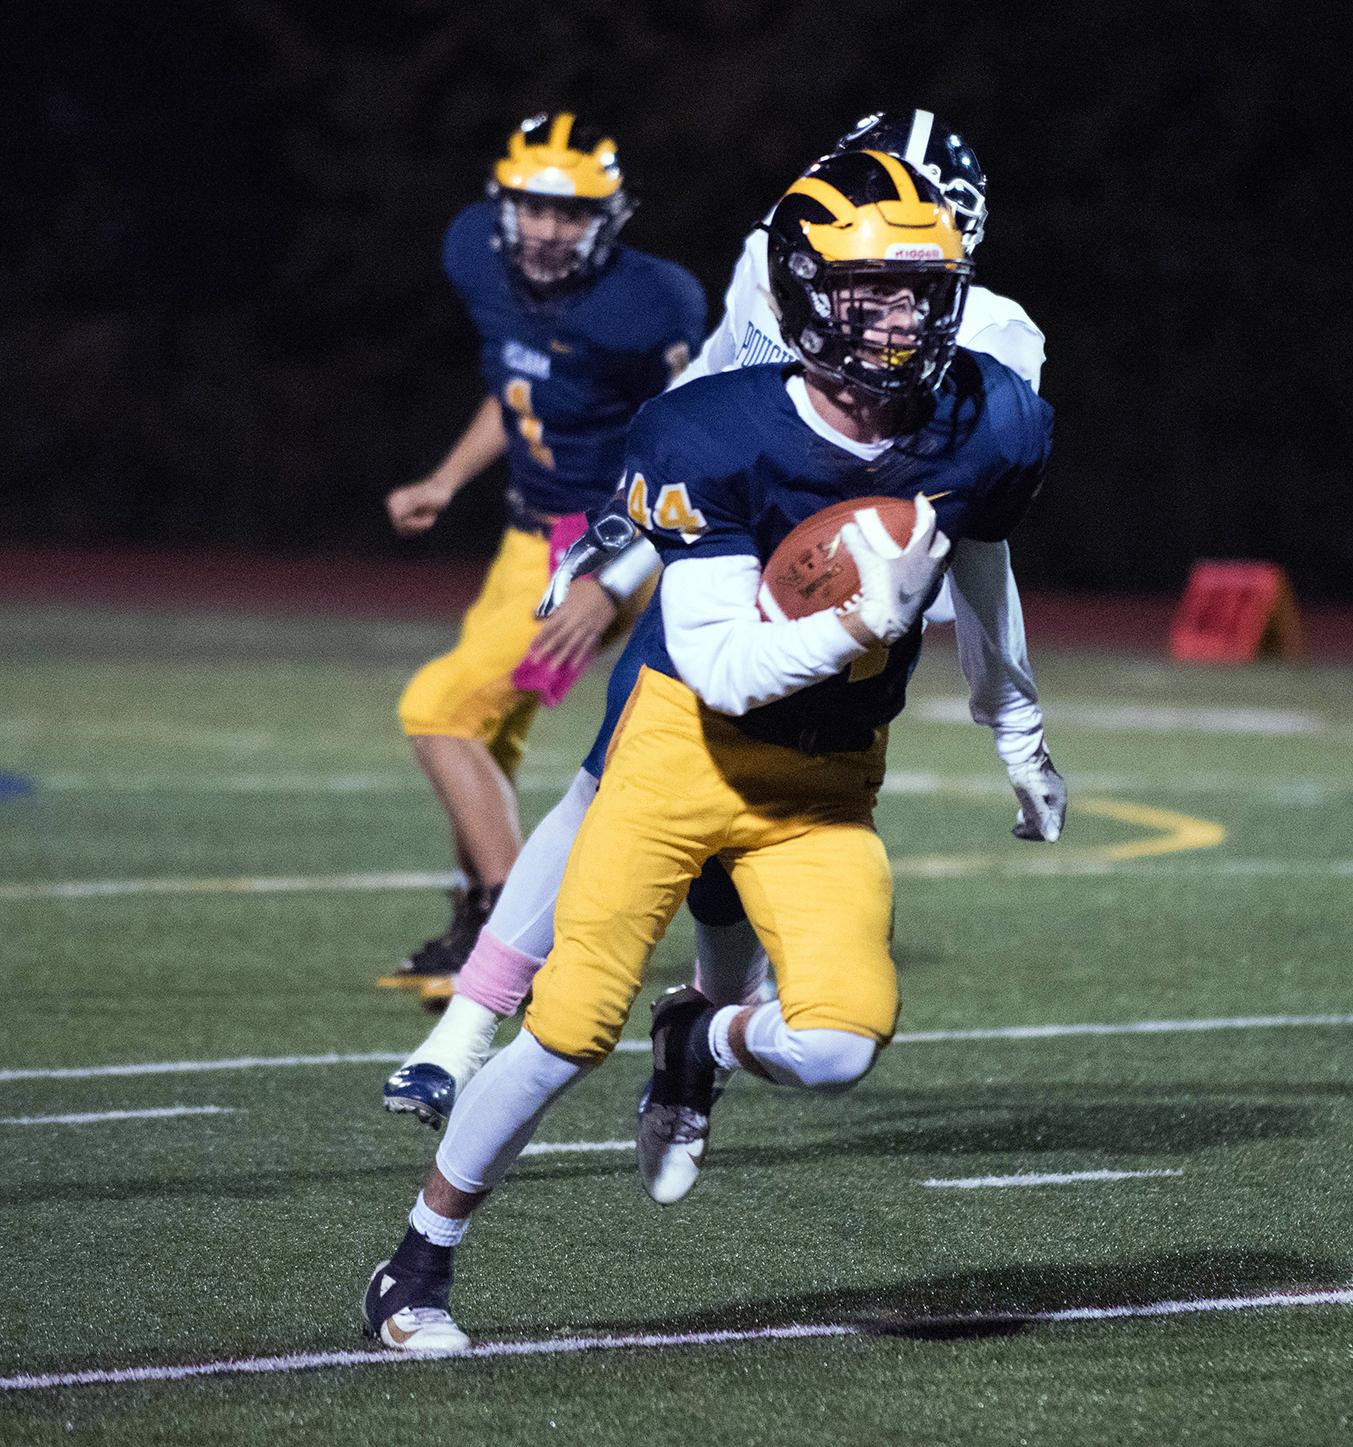 Junior Nick Senerchia sprints down the field.